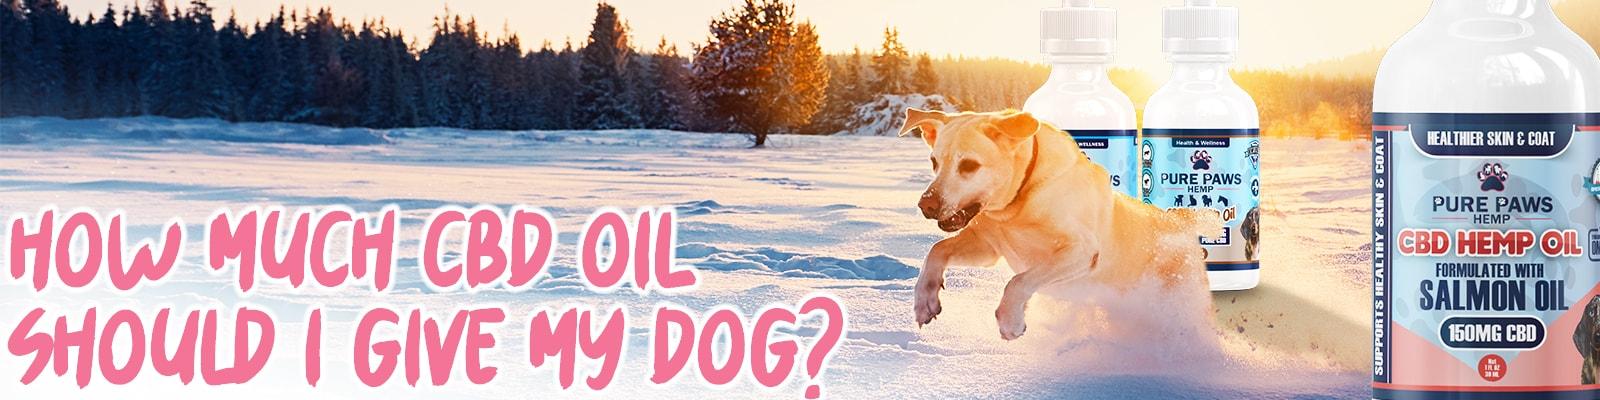 pure paws cbd hemp oil for dogs dosage